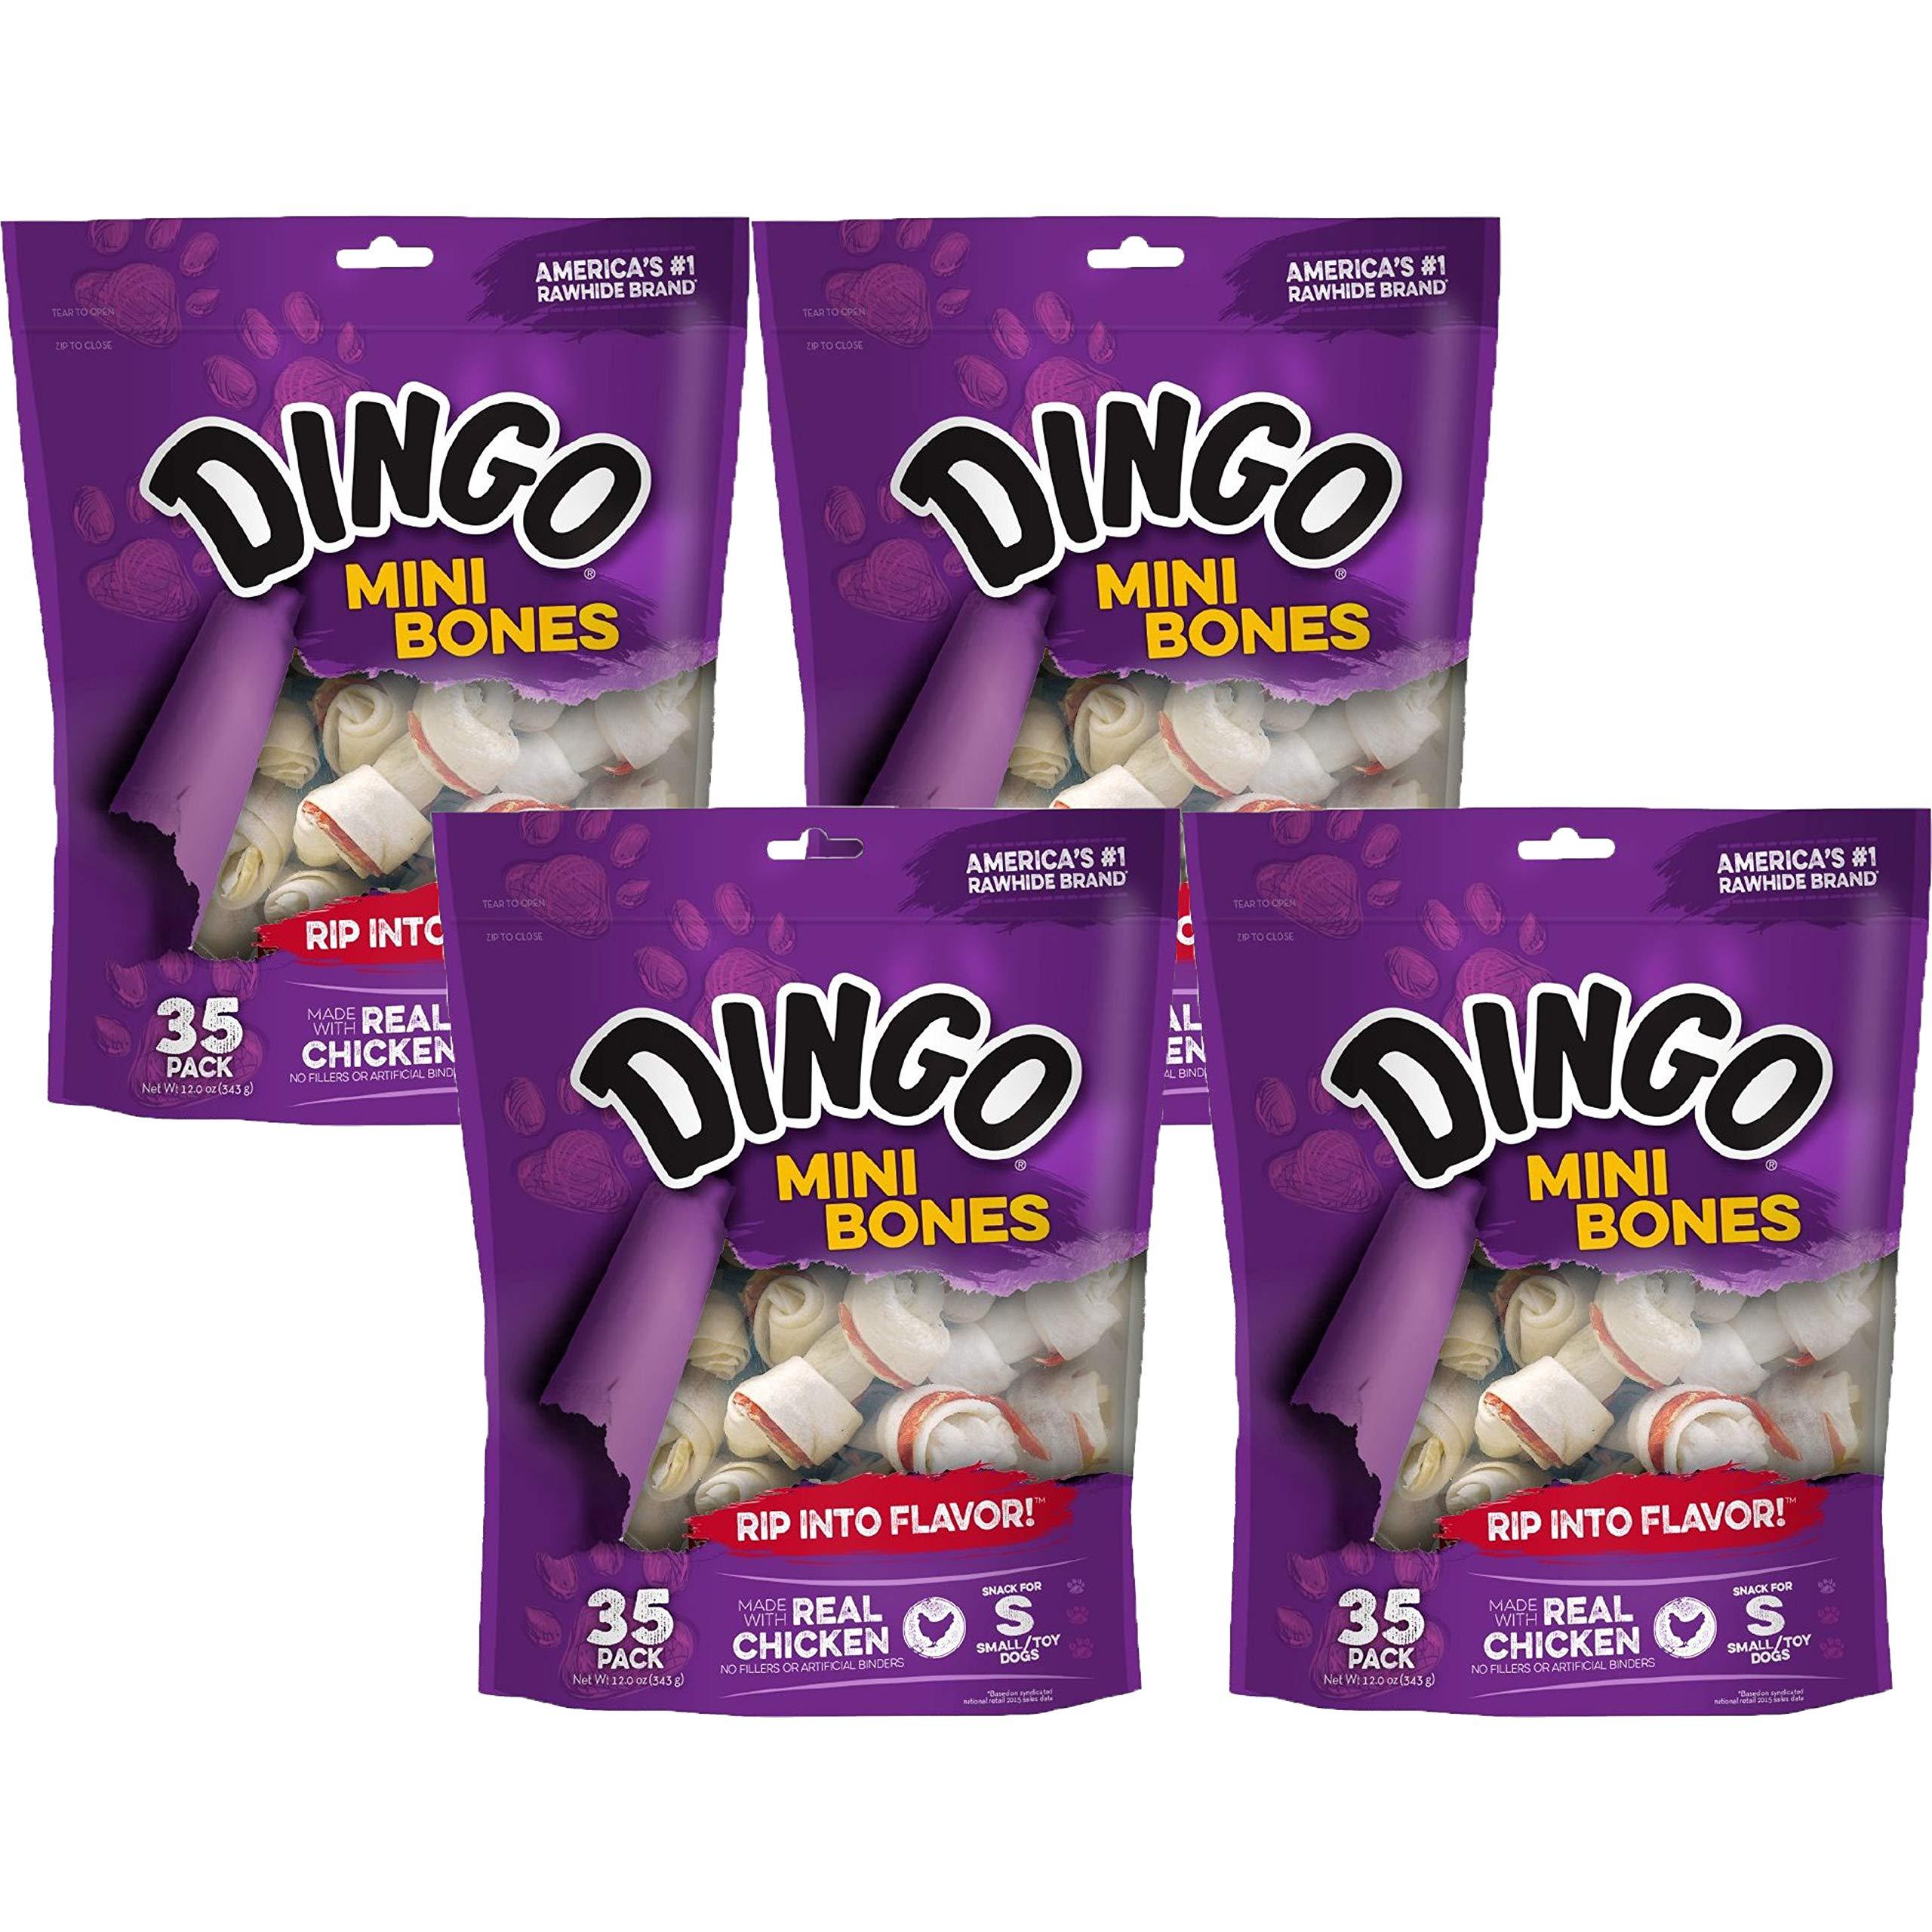 Dingo Non-China Sourced Premium Dog Chews and Treats (140 Count | Mini Bones) by Dingo